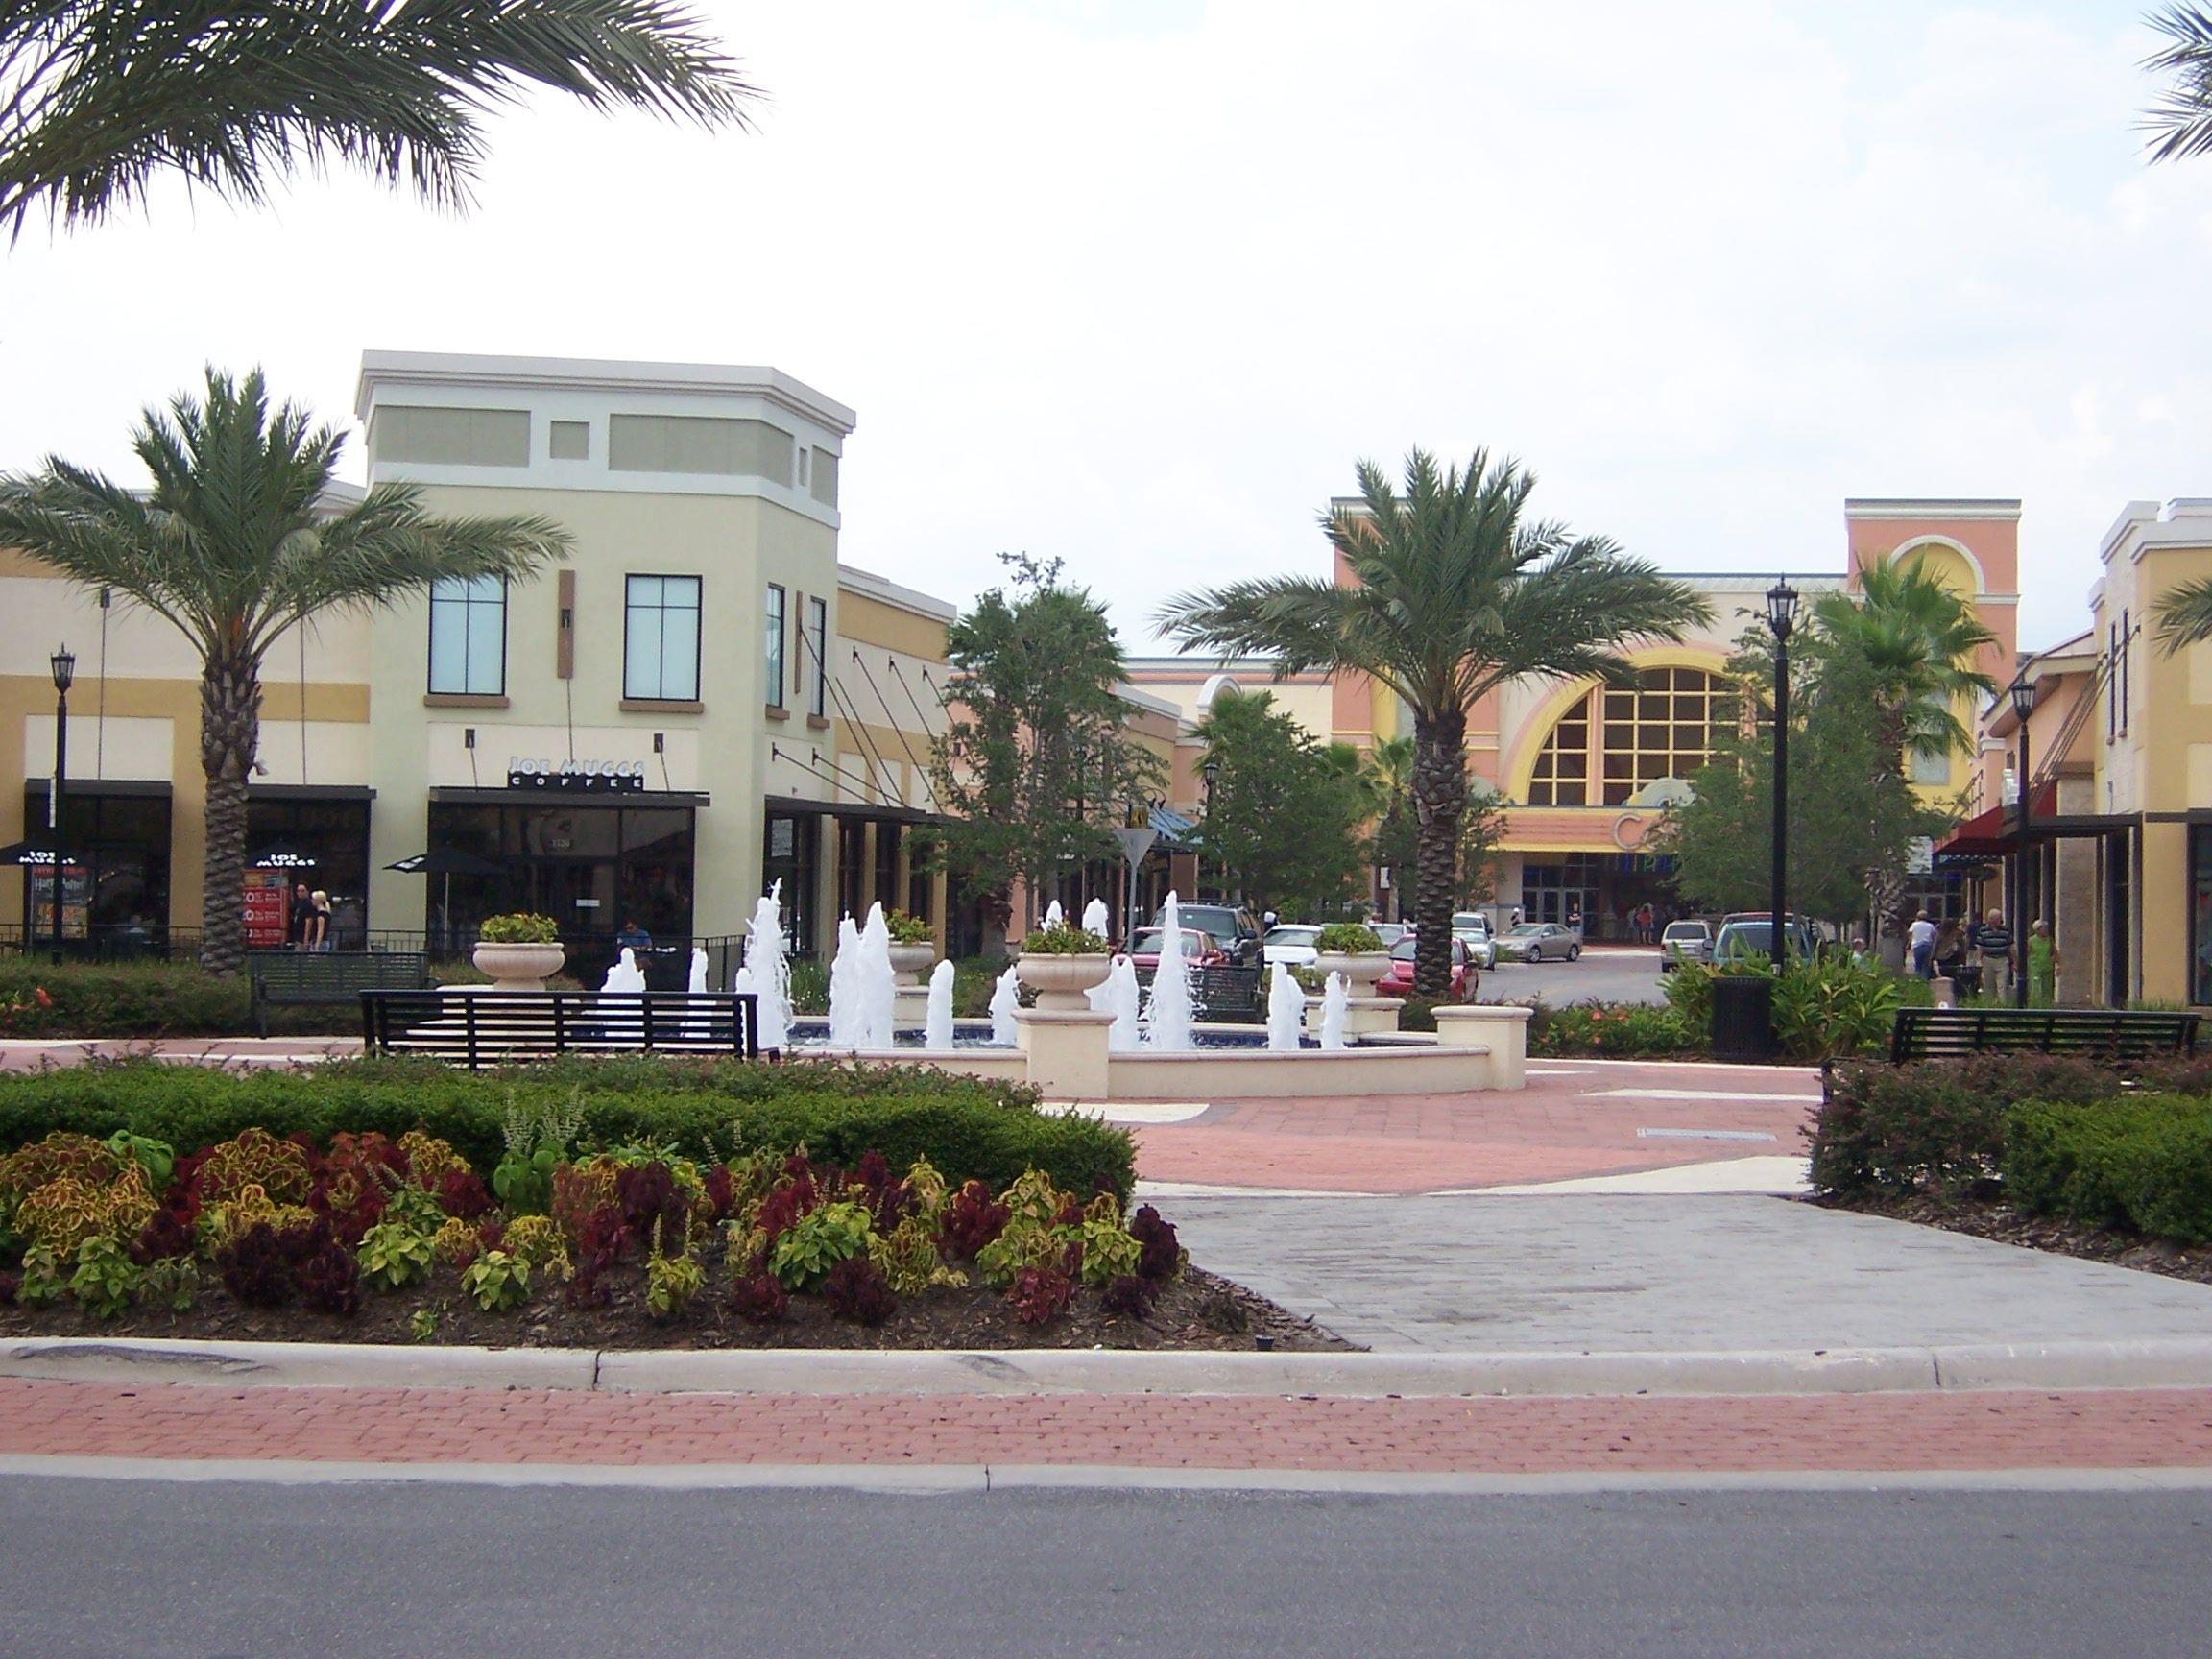 Best LAKELAND FL Images On Pinterest - Florida map lakeland fl